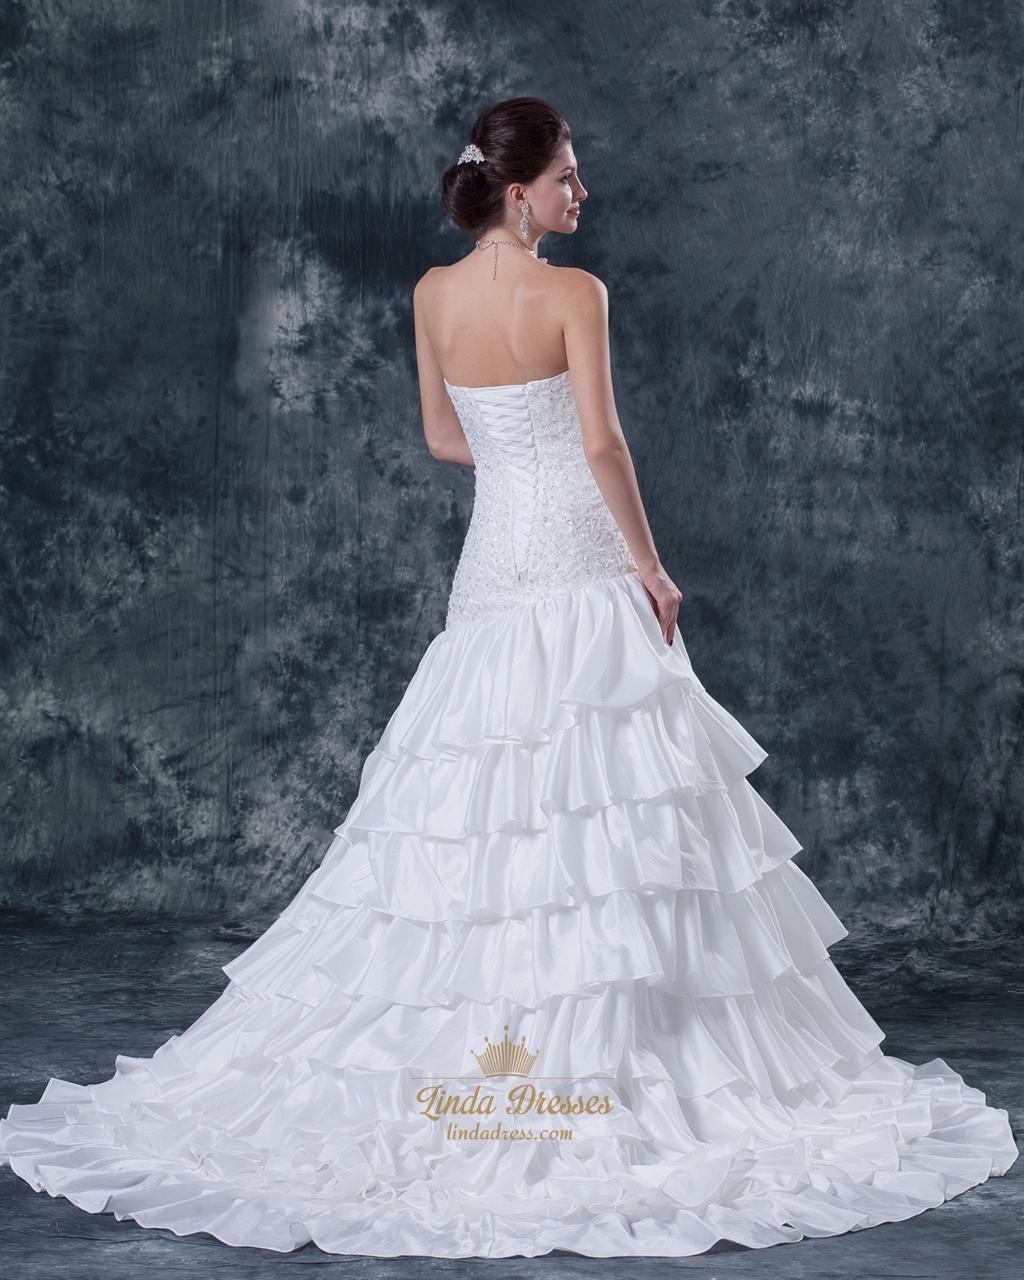 White Mermaid Strapless Beaded Bodice Wedding Dress With